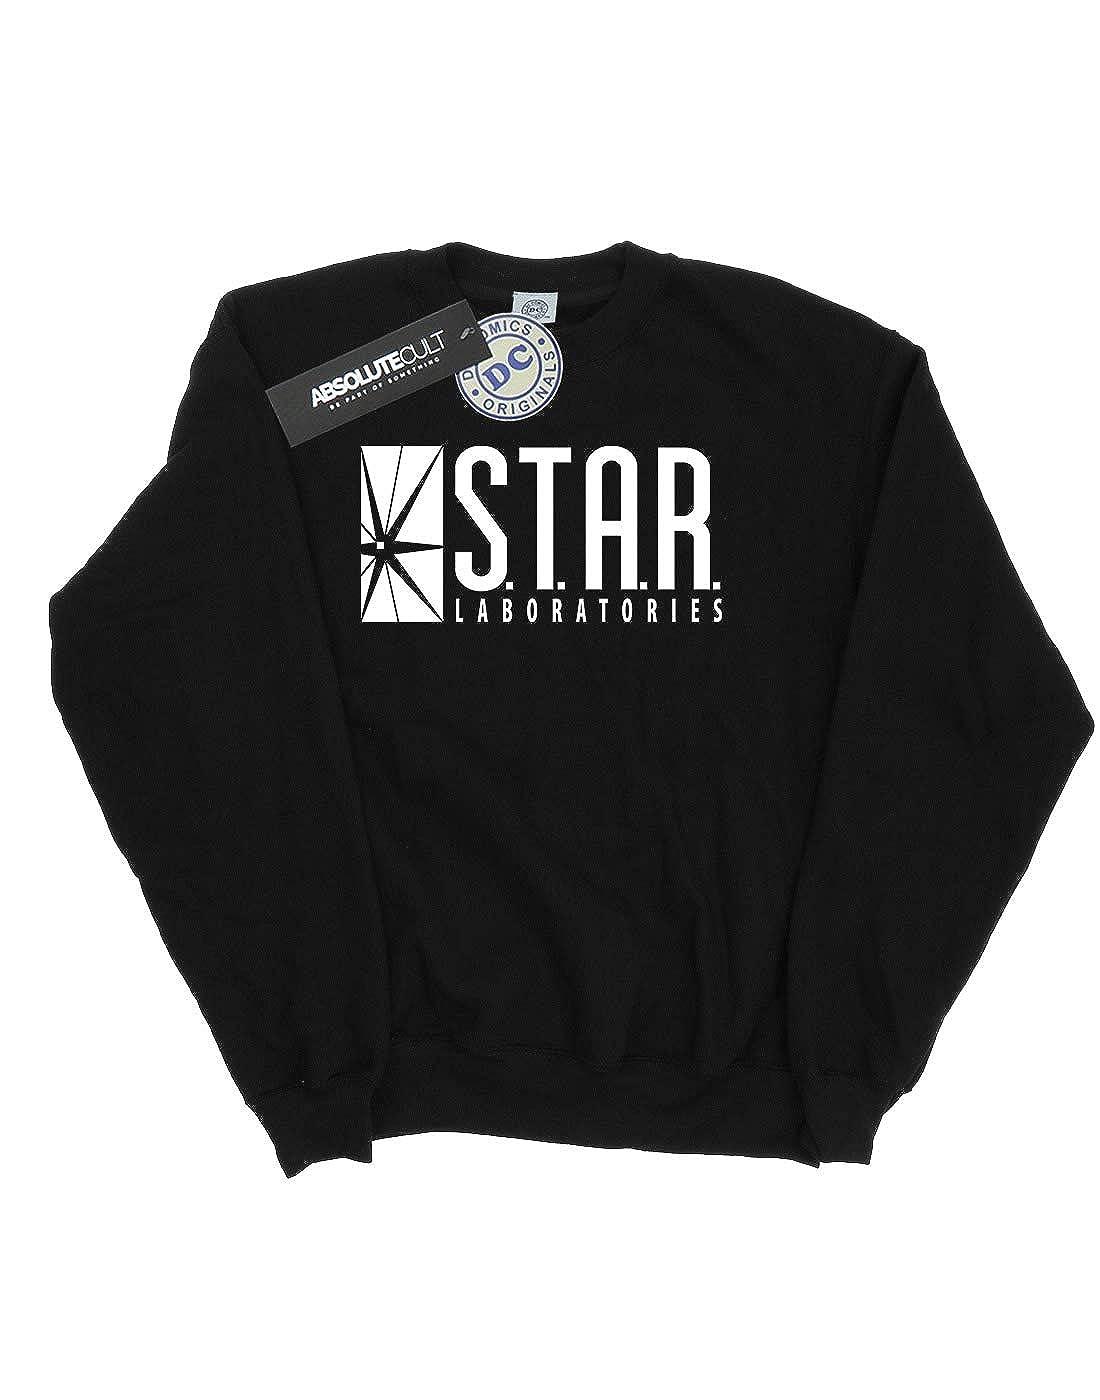 DC Comics Girls The Flash Star Labs Sweatshirt